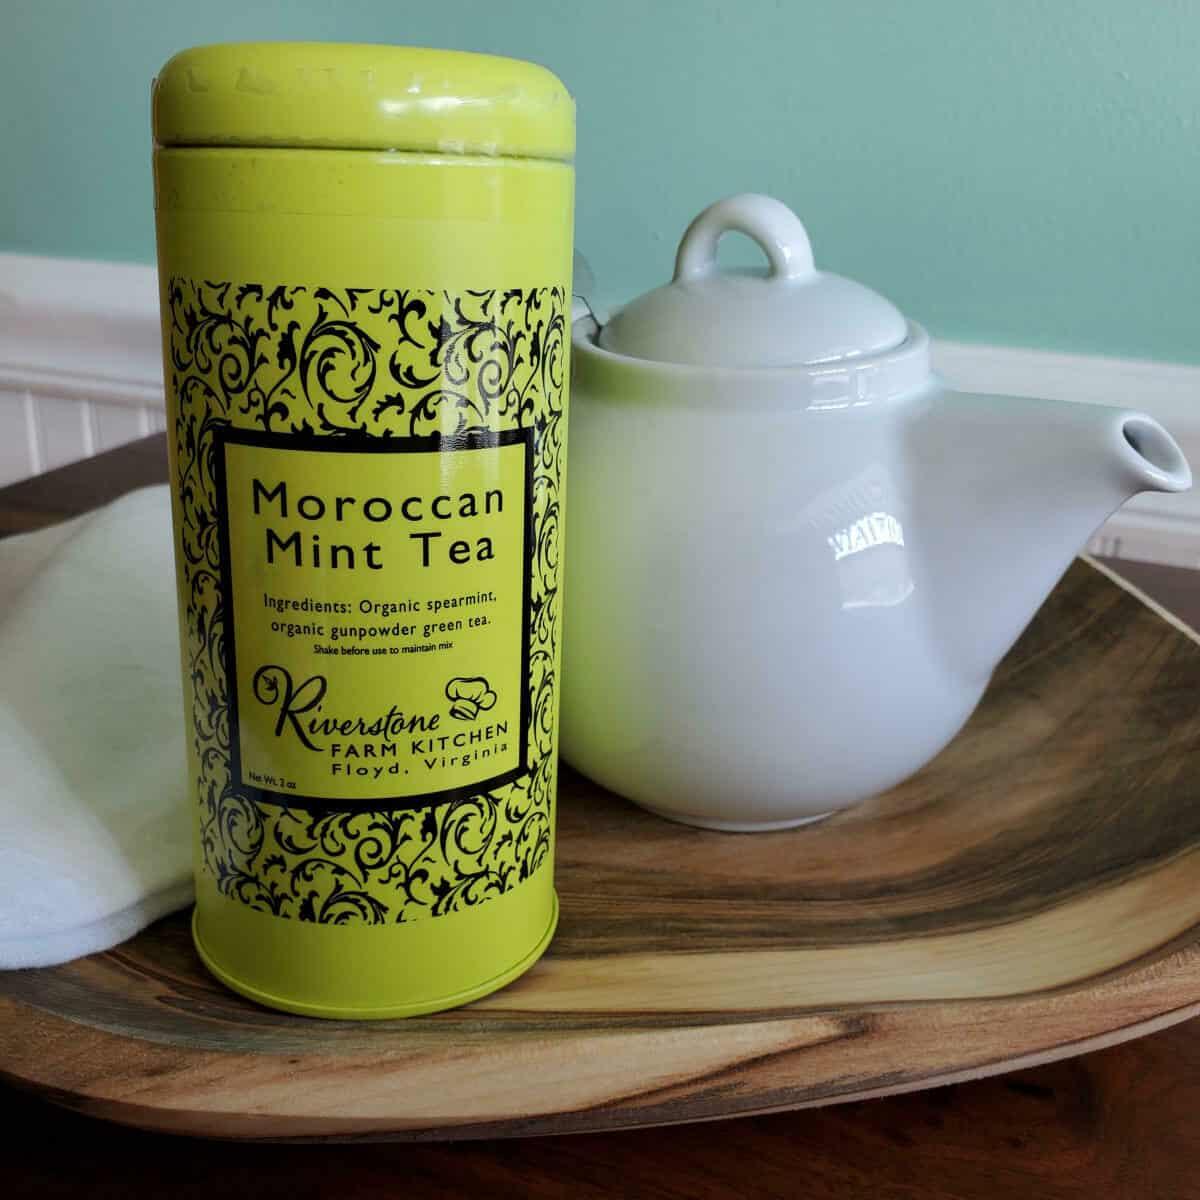 Riverstone Organic Farm Moroccan Mint Tea